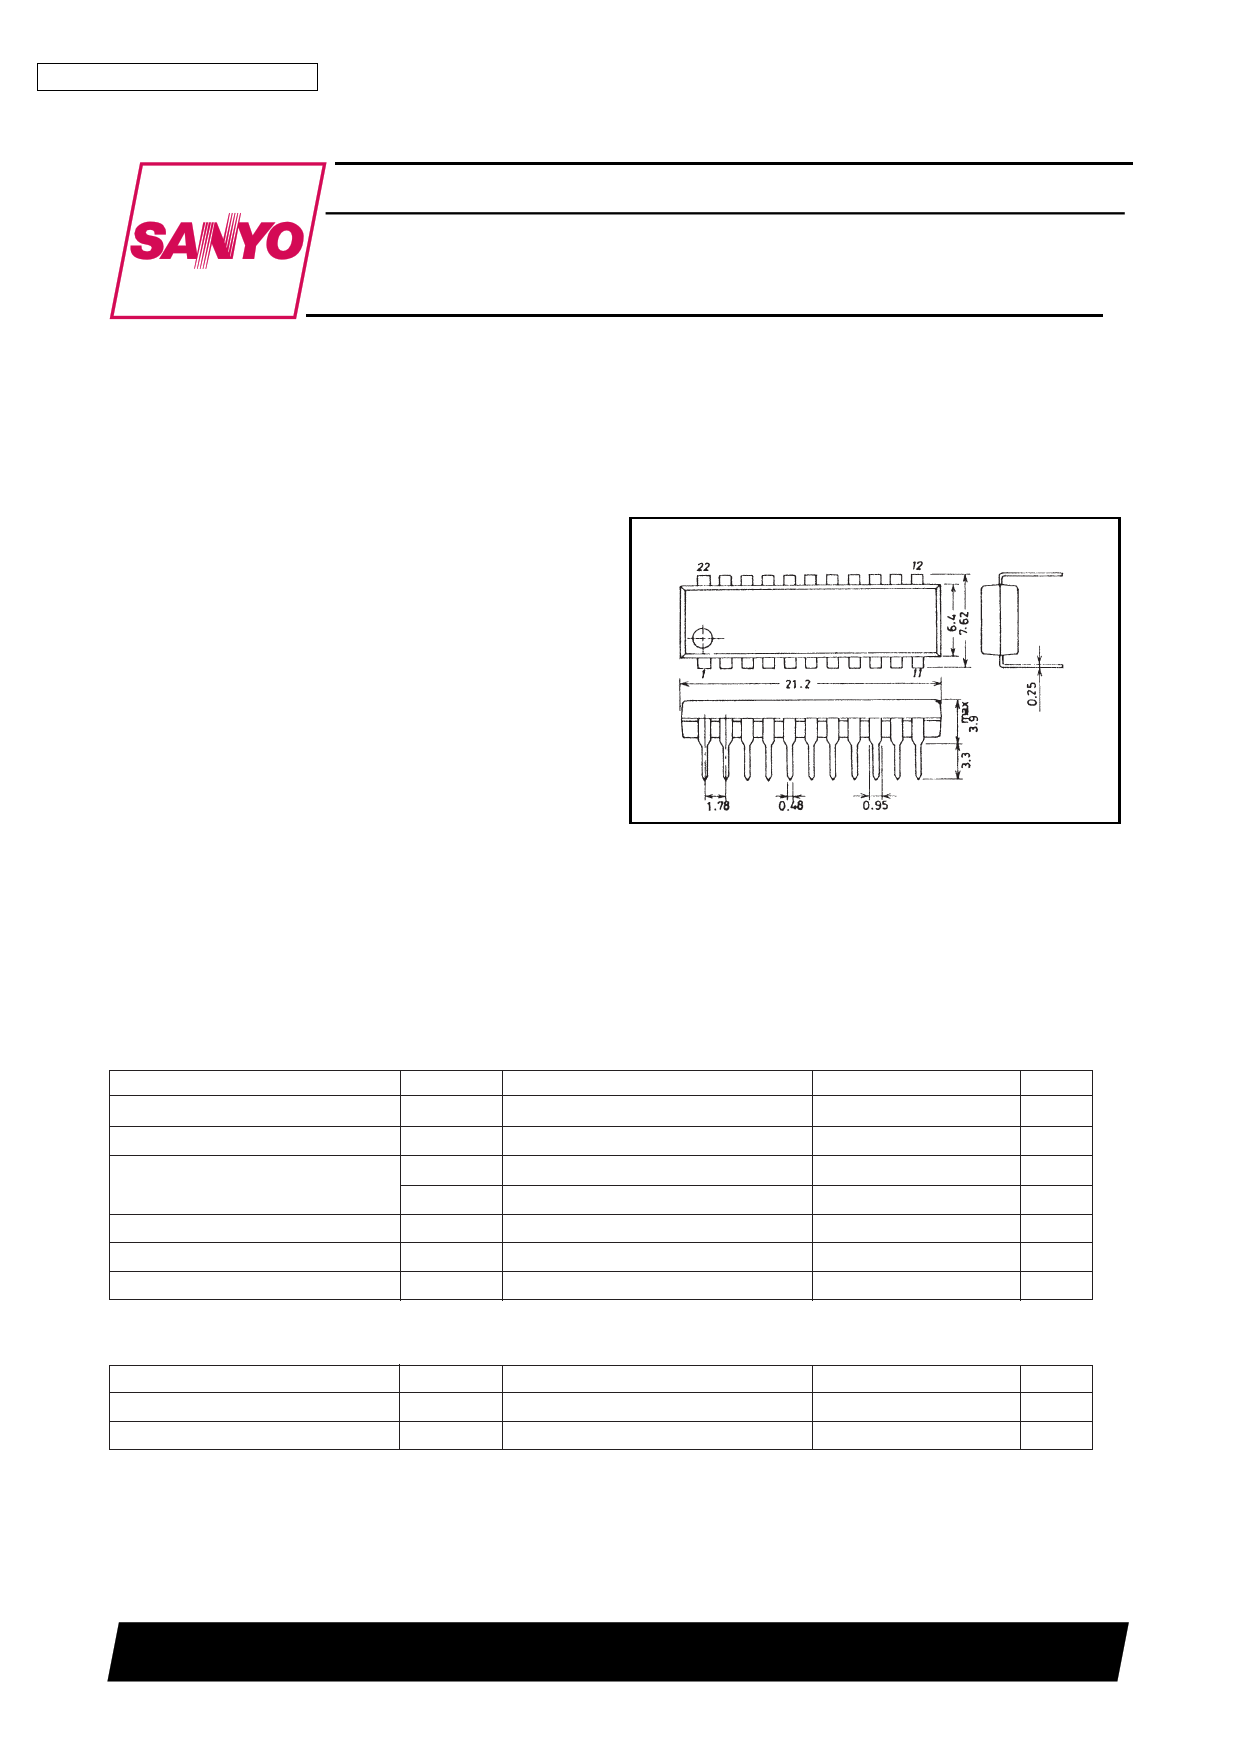 Rf Detector Circuit Symbol Engine Control Wiring Diagram La1265 Datasheet Pdf Pinout Fm Am Tuner Of Theory